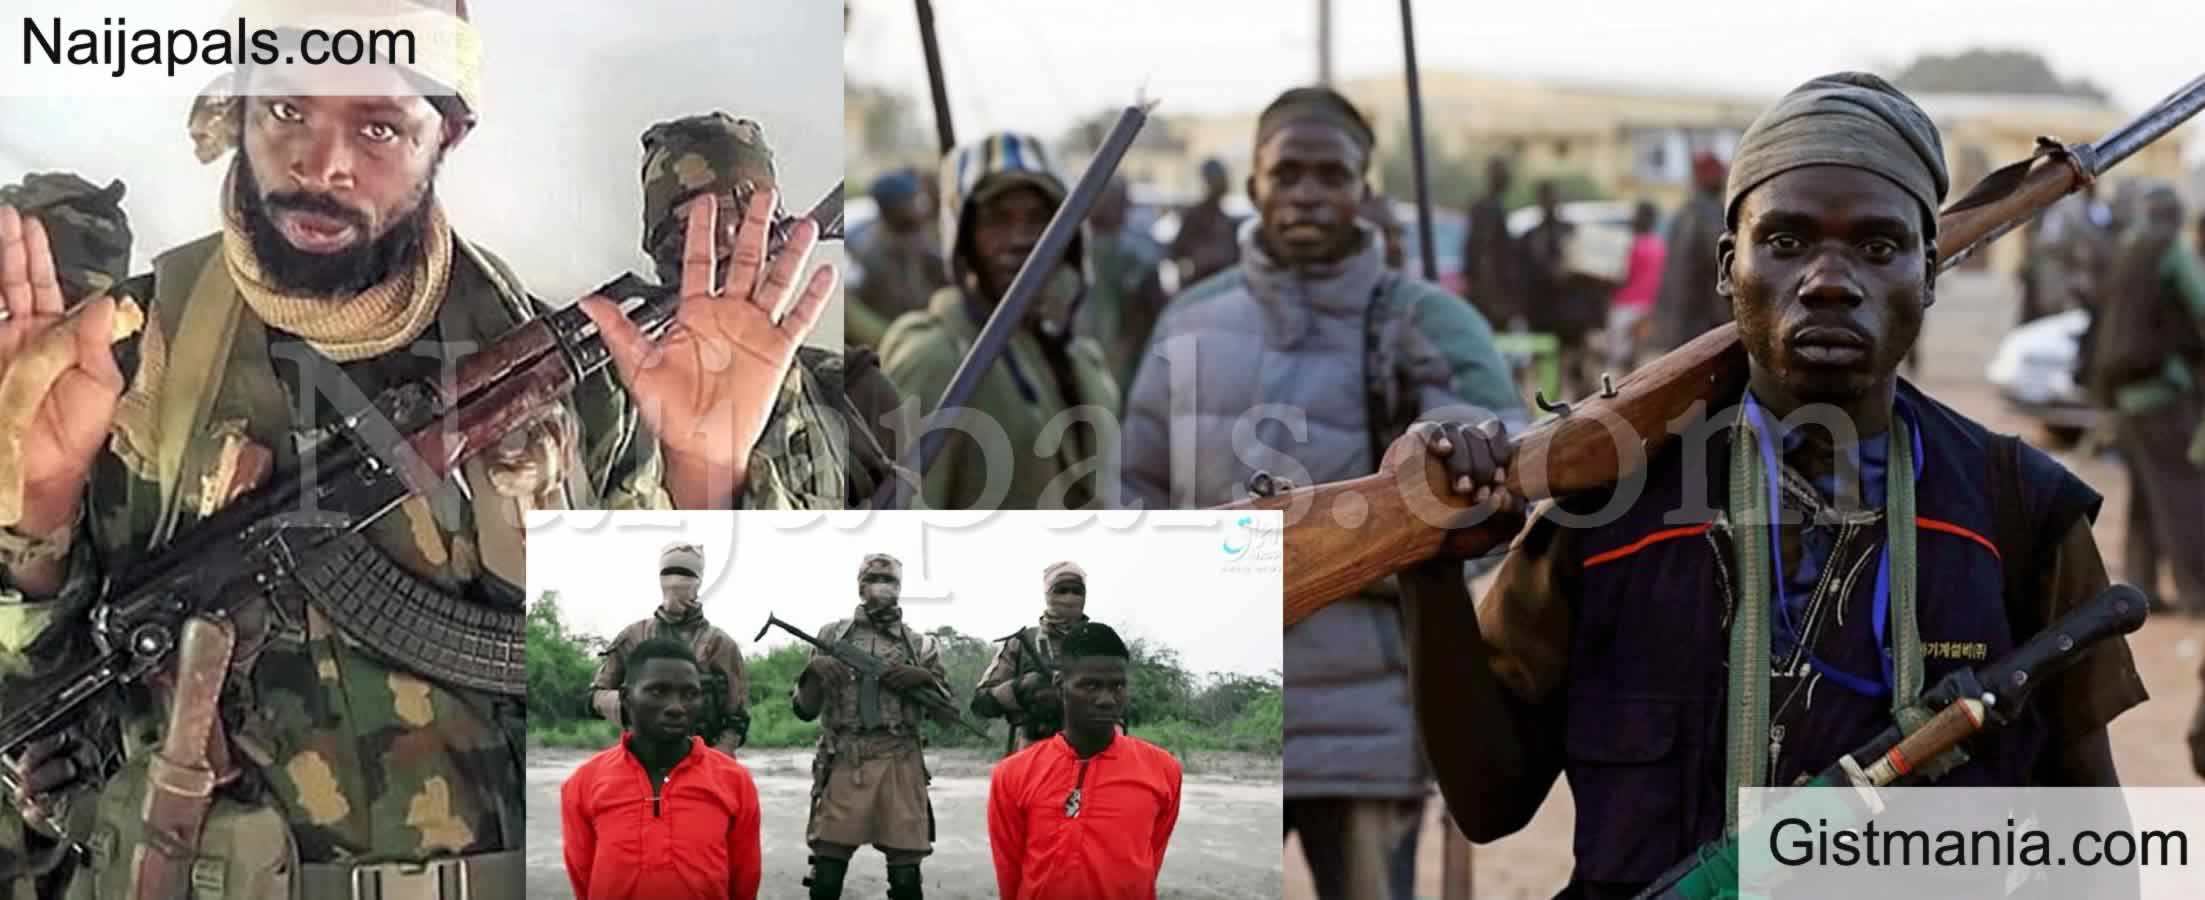 <img alt='.' class='lazyload' data-src='https://img.gistmania.com/emot/smh.gif' /><img alt='.' class='lazyload' data-src='https://img.gistmania.com/emot/news.gif' /> <b>Husband And Wife Killed As Boko Haram Terrorists Bombs Borno Again</b>